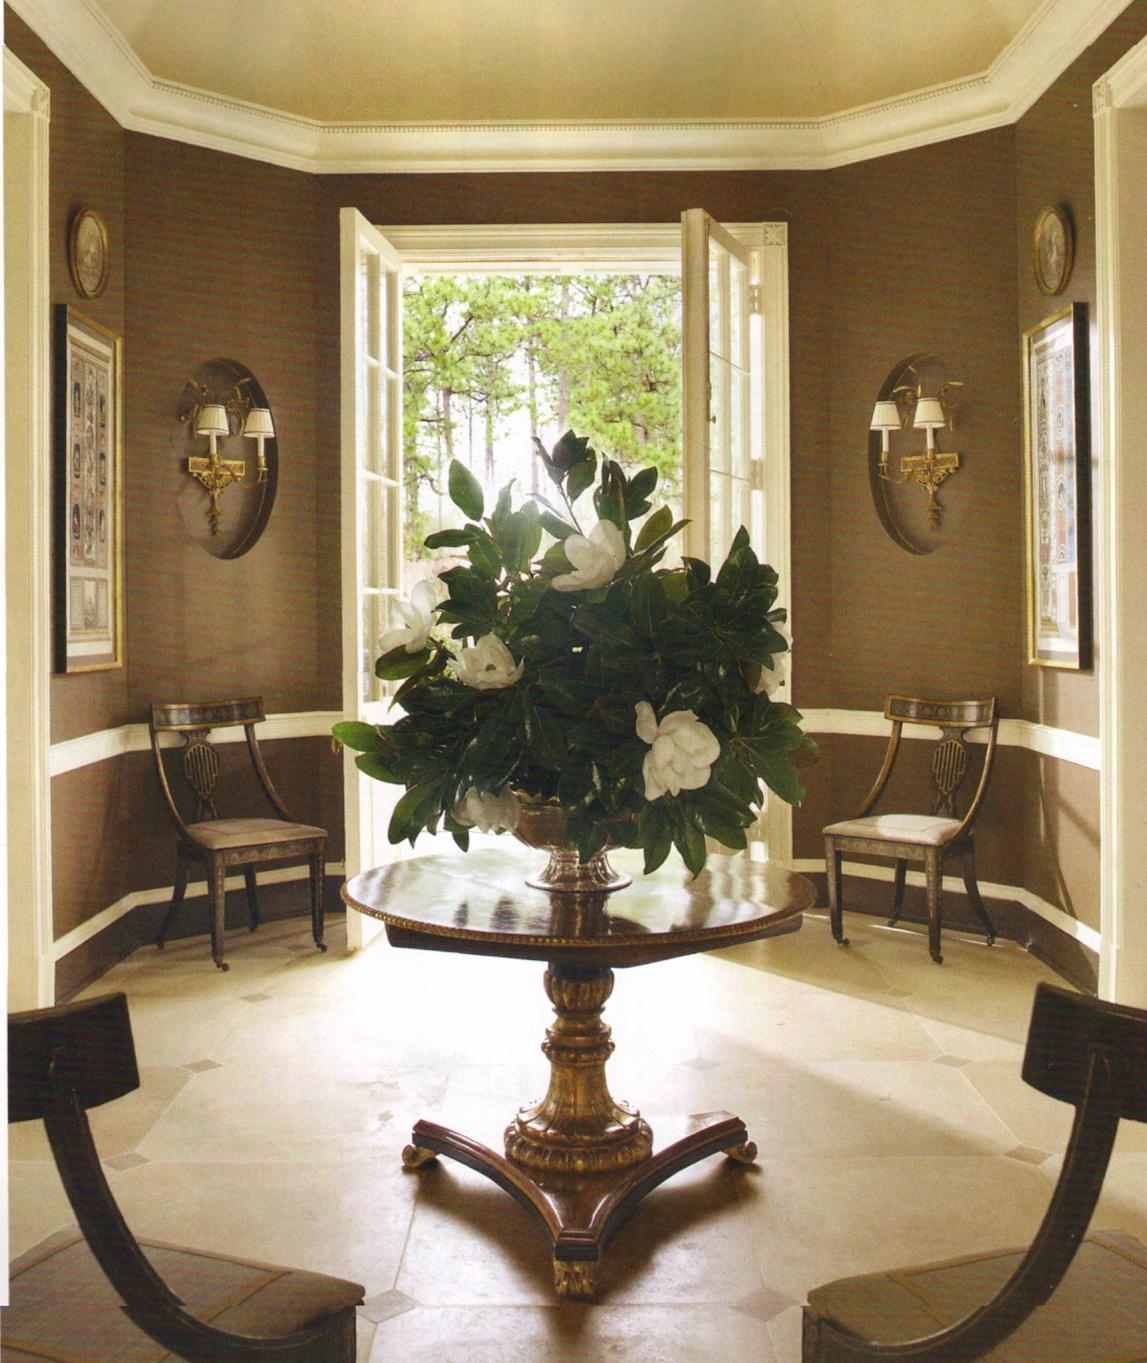 Us Interior Designs Richard Keith Langham And Lewis Graeber Design In Mississippi